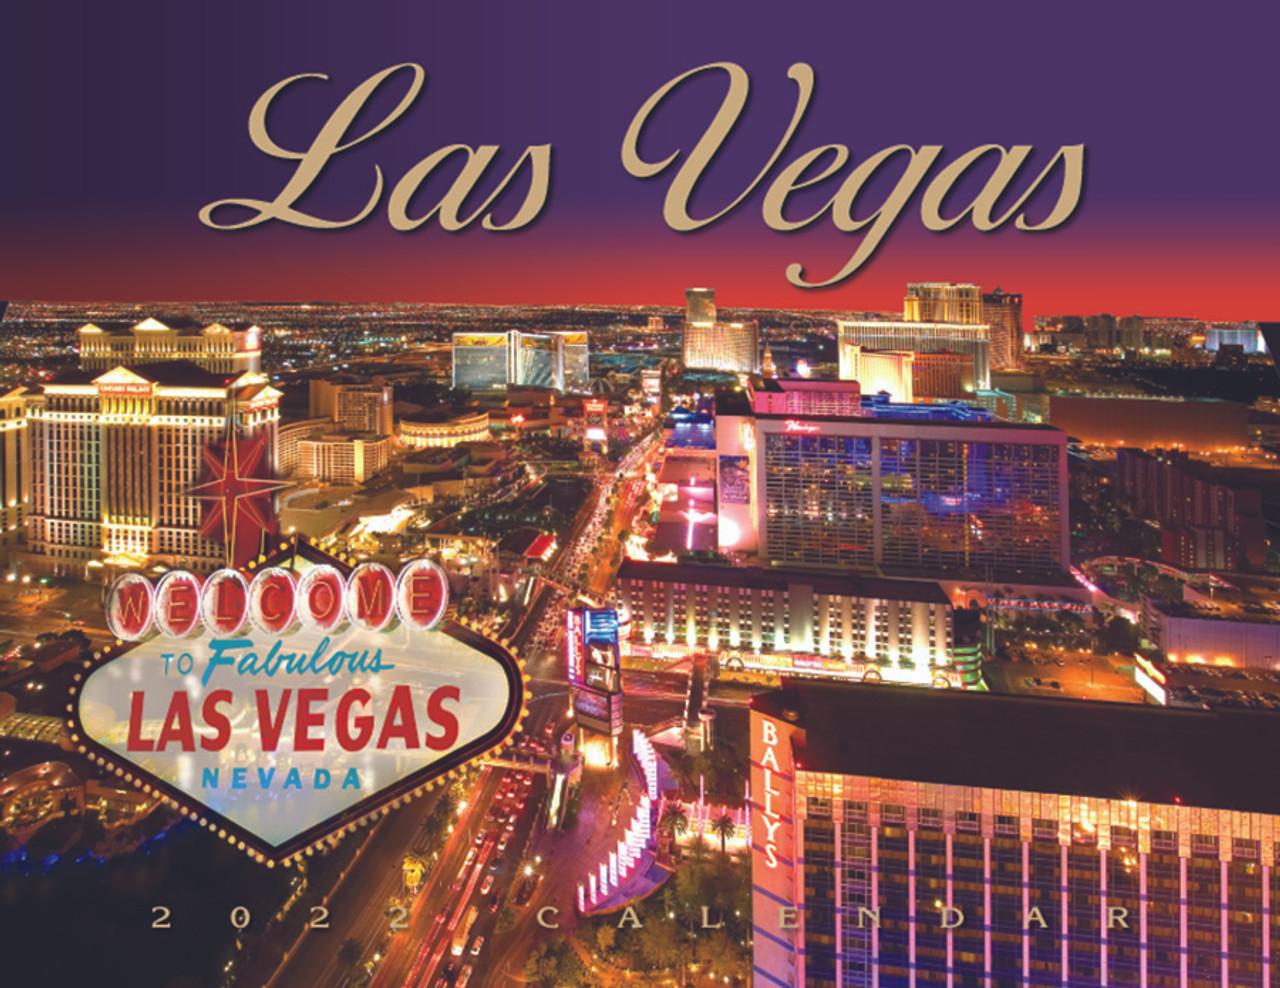 Las Vegas Calendar 2022.2022 Las Vegas Scenic Calendar